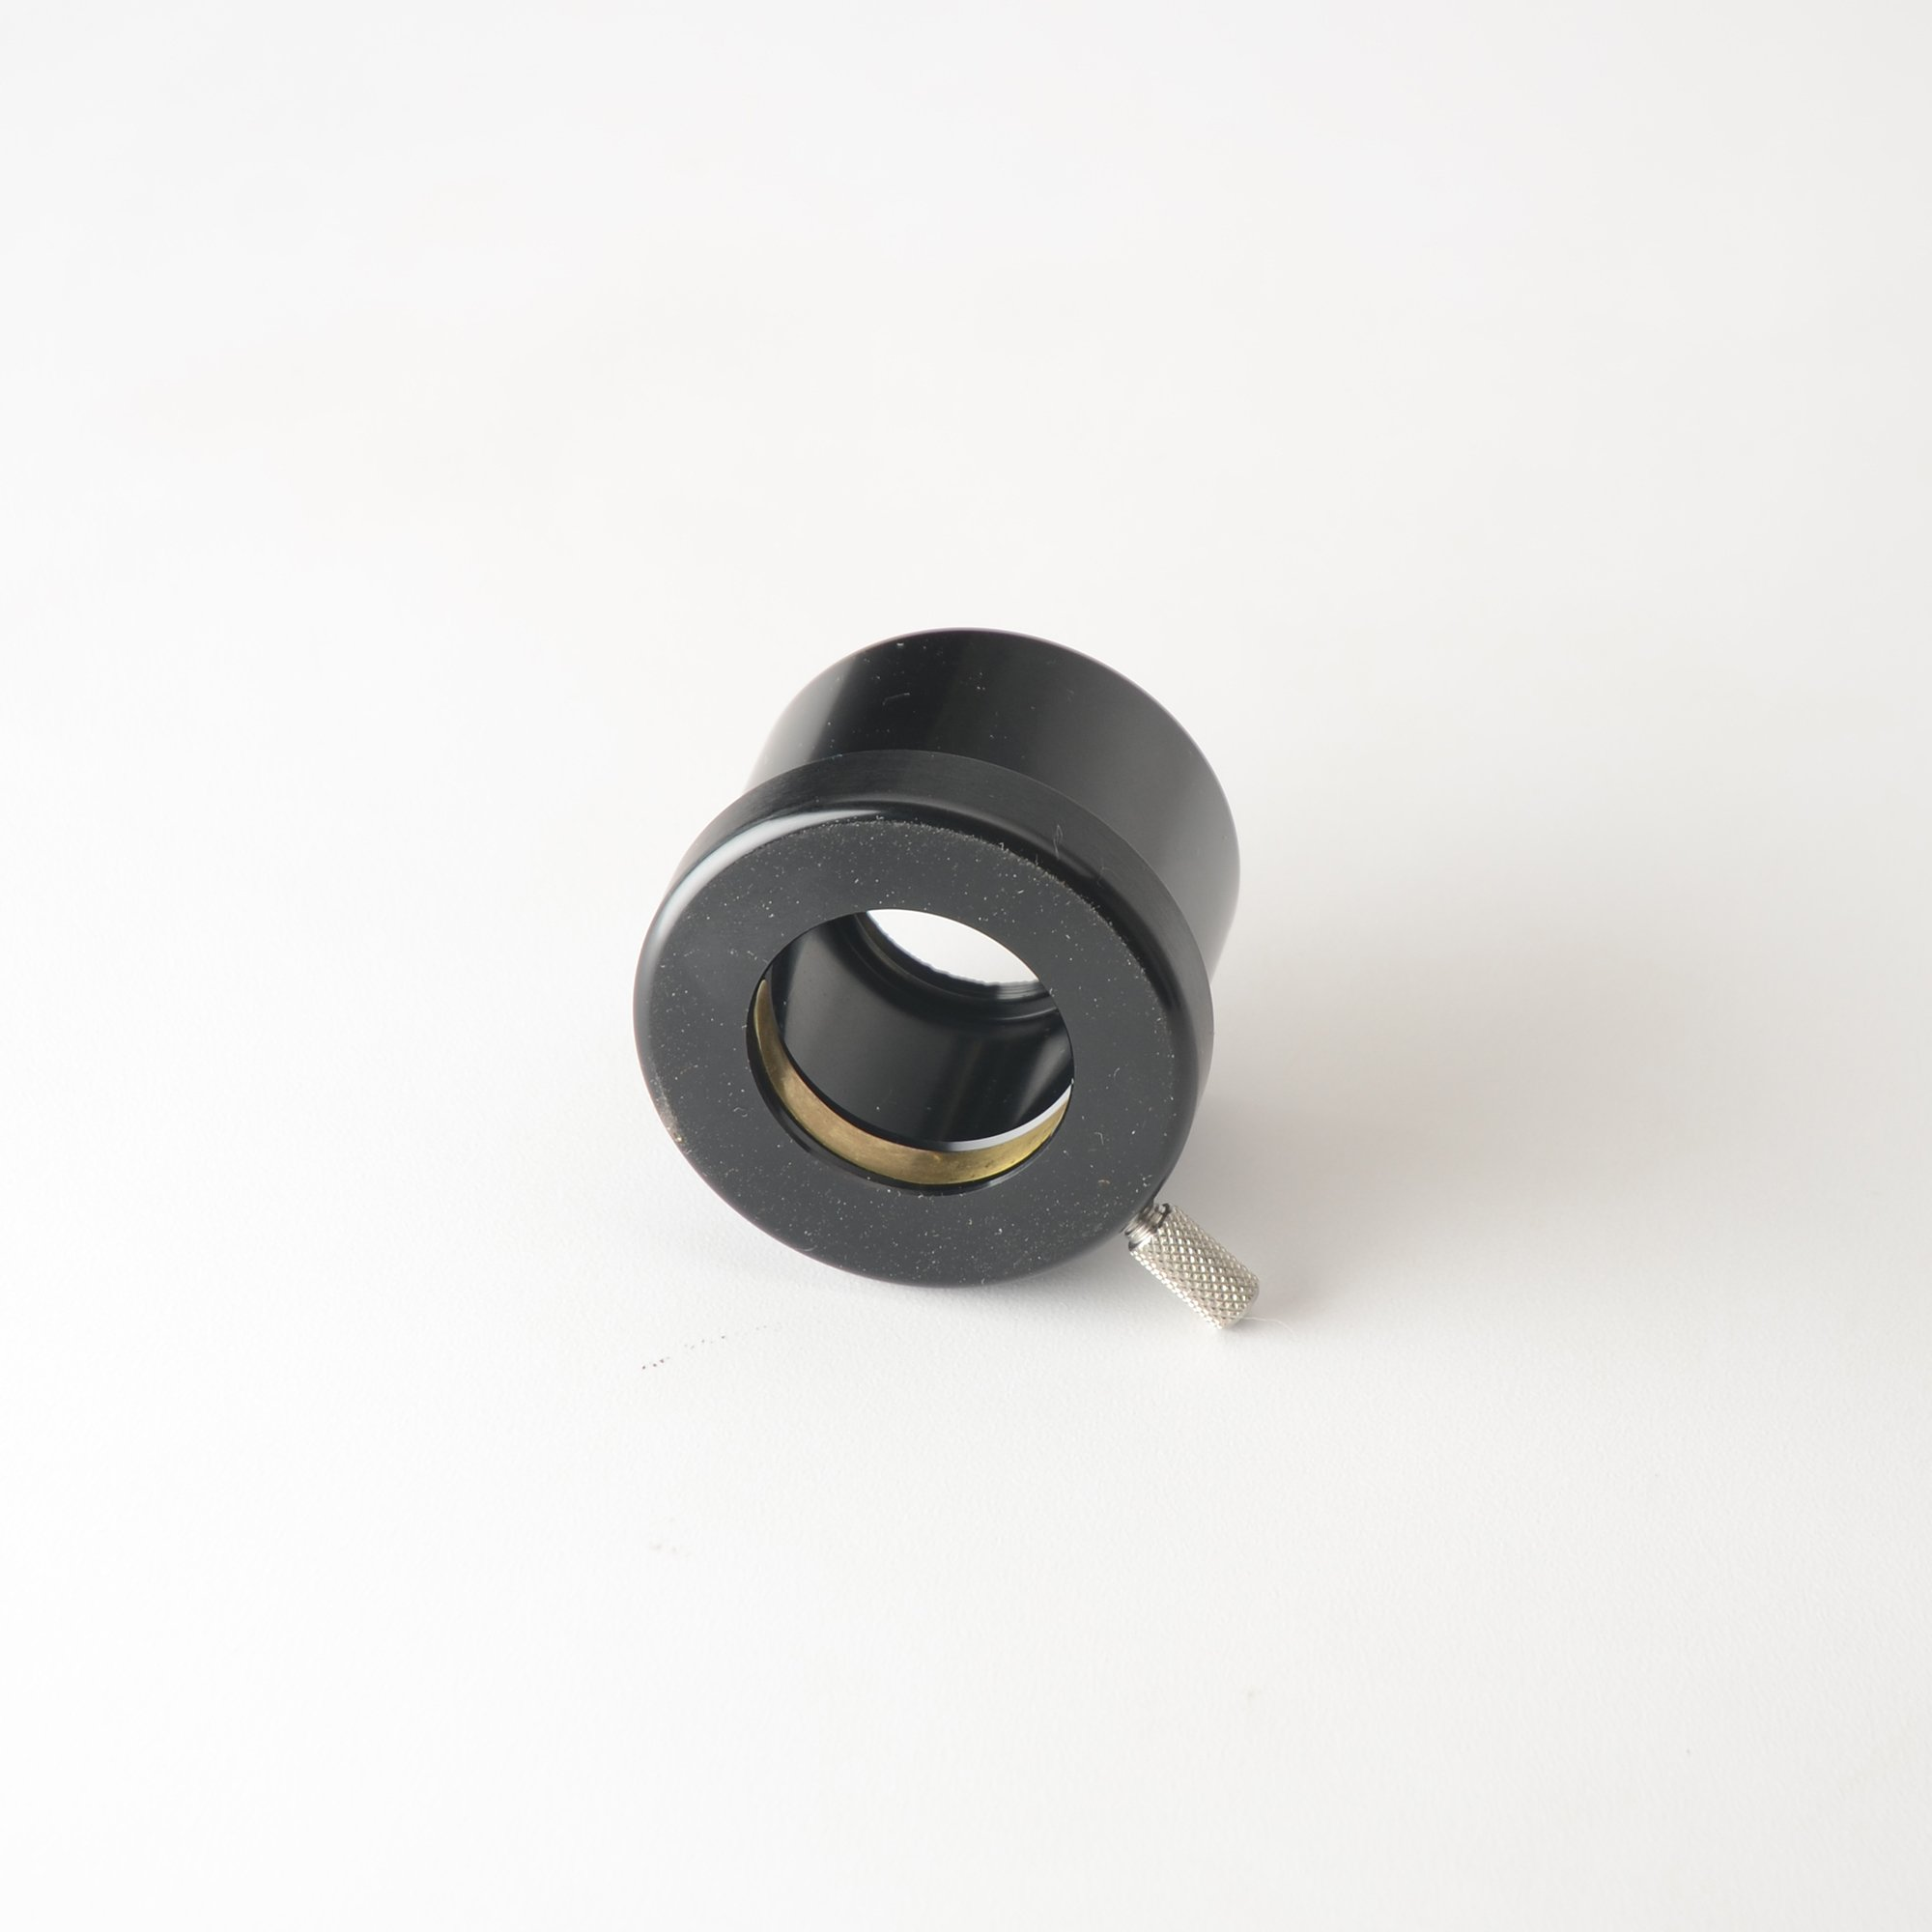 2 inch focuser to 1.25 inch eyepiece adapter, FAV100